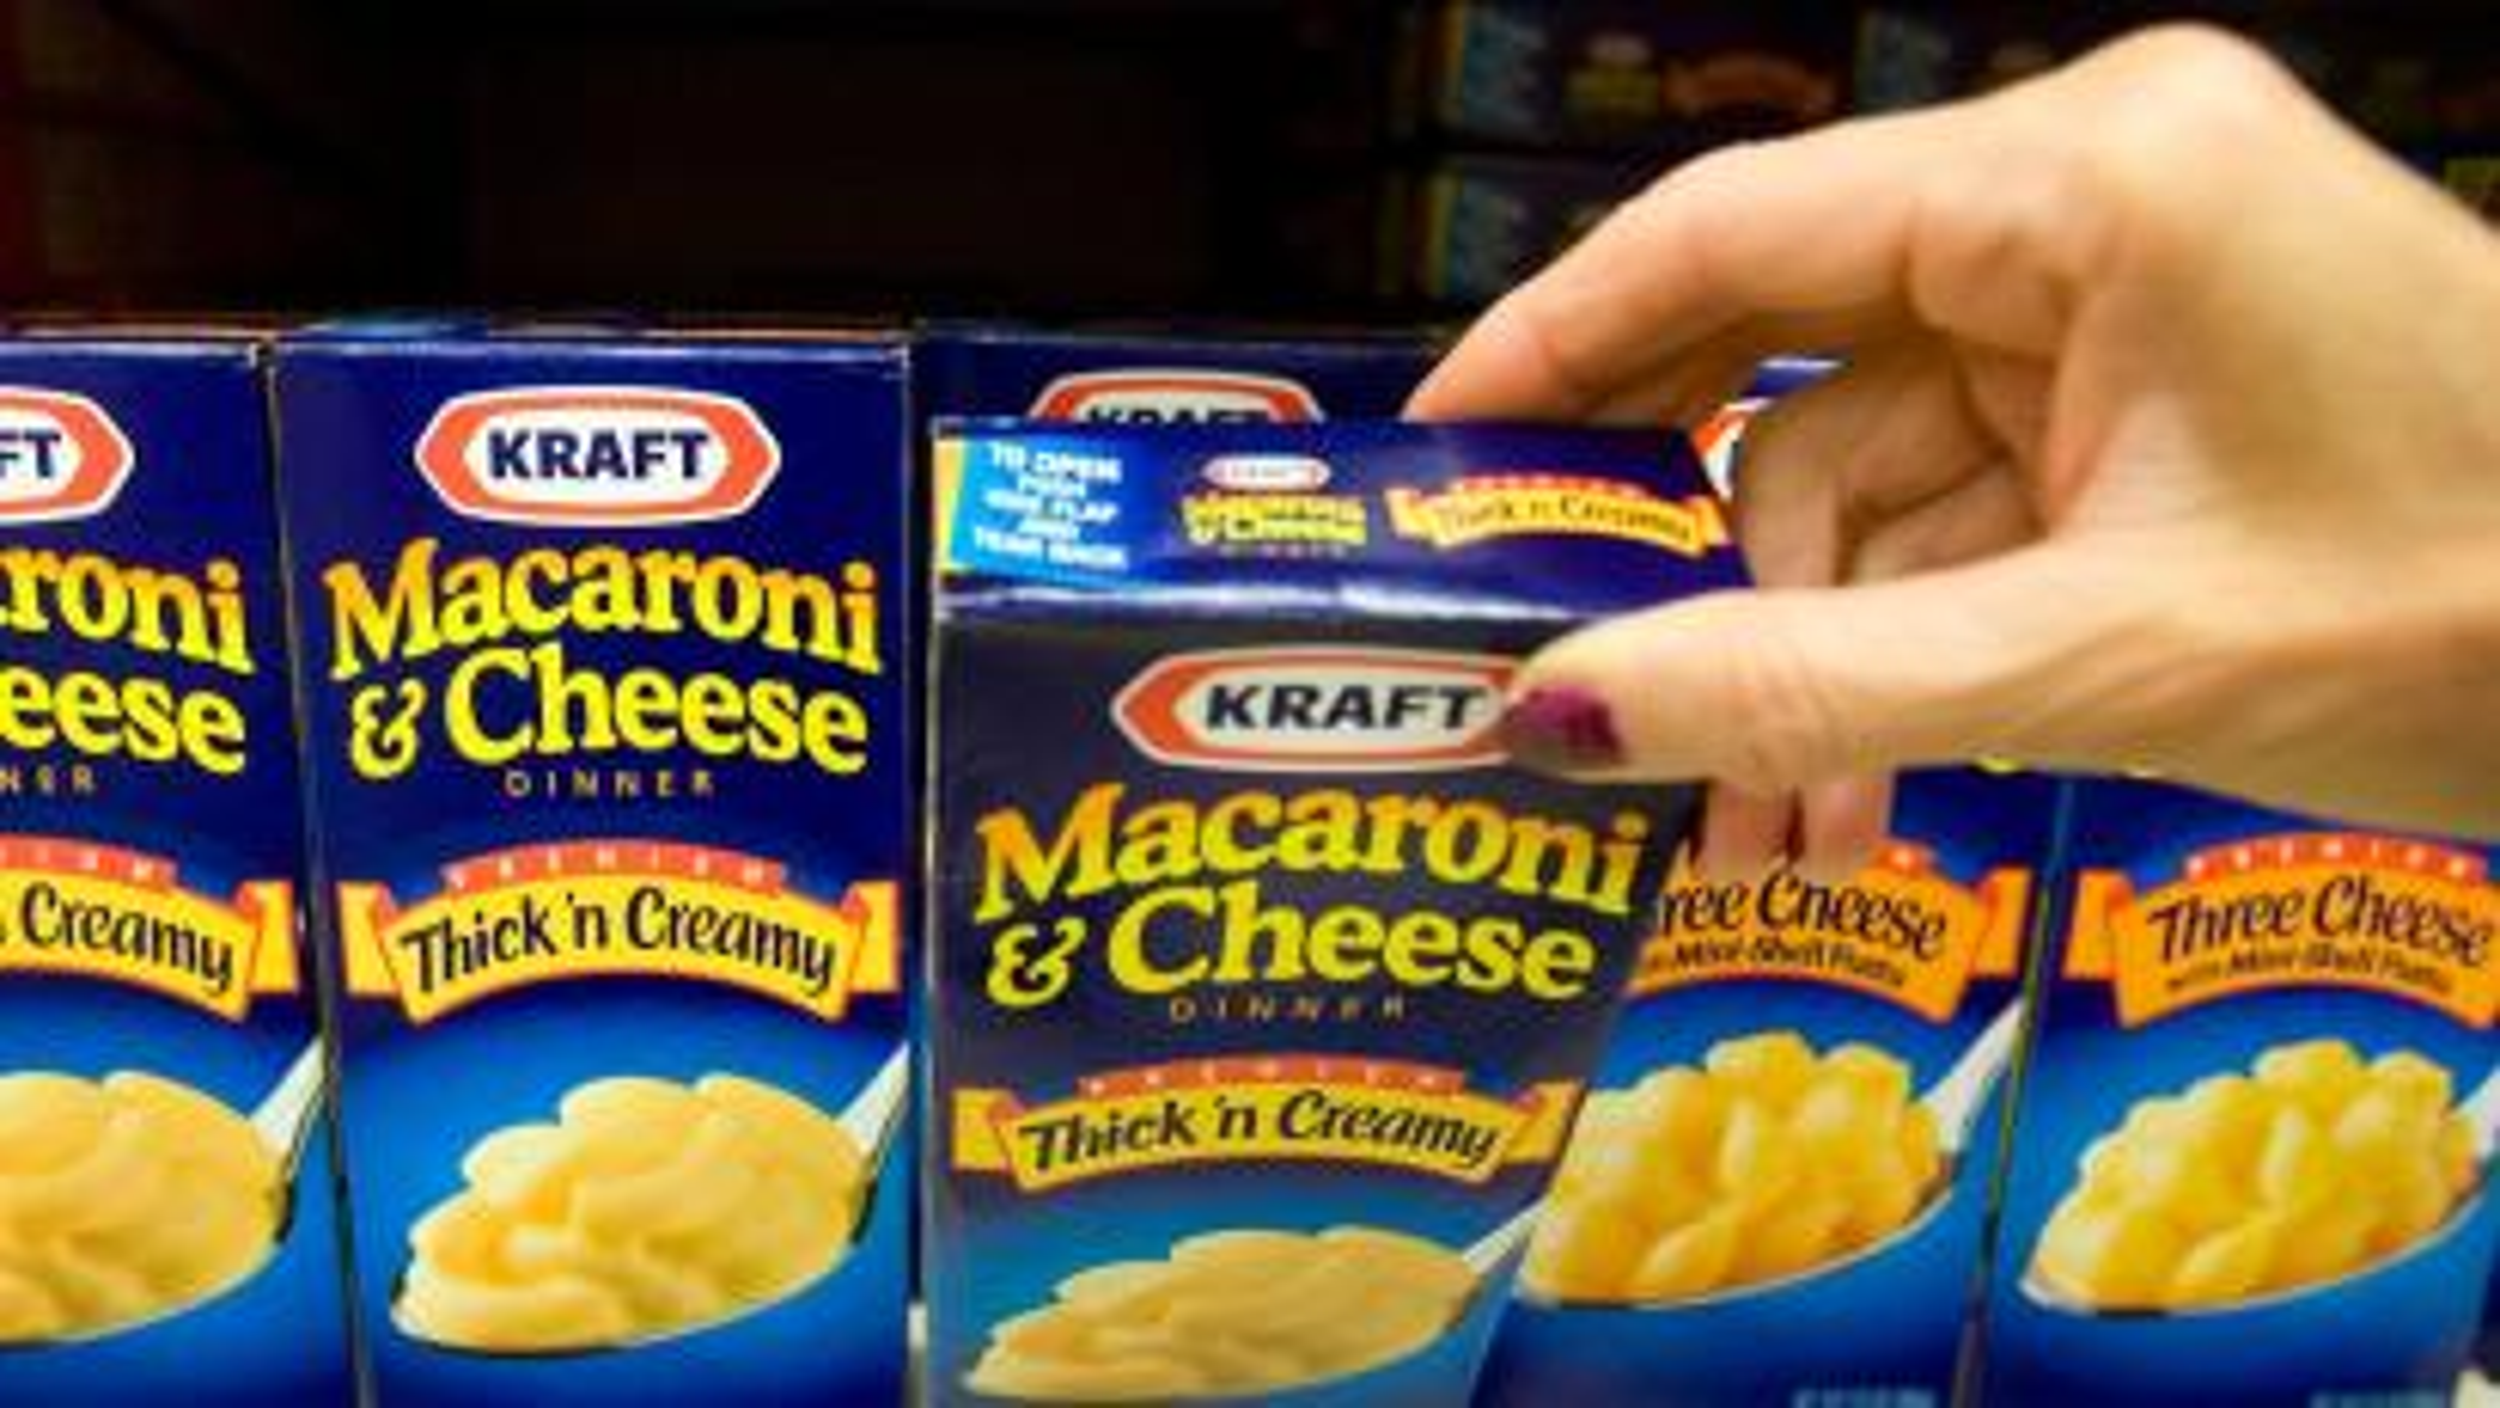 Why do white people eat bland food like unseasoned potato salad? A